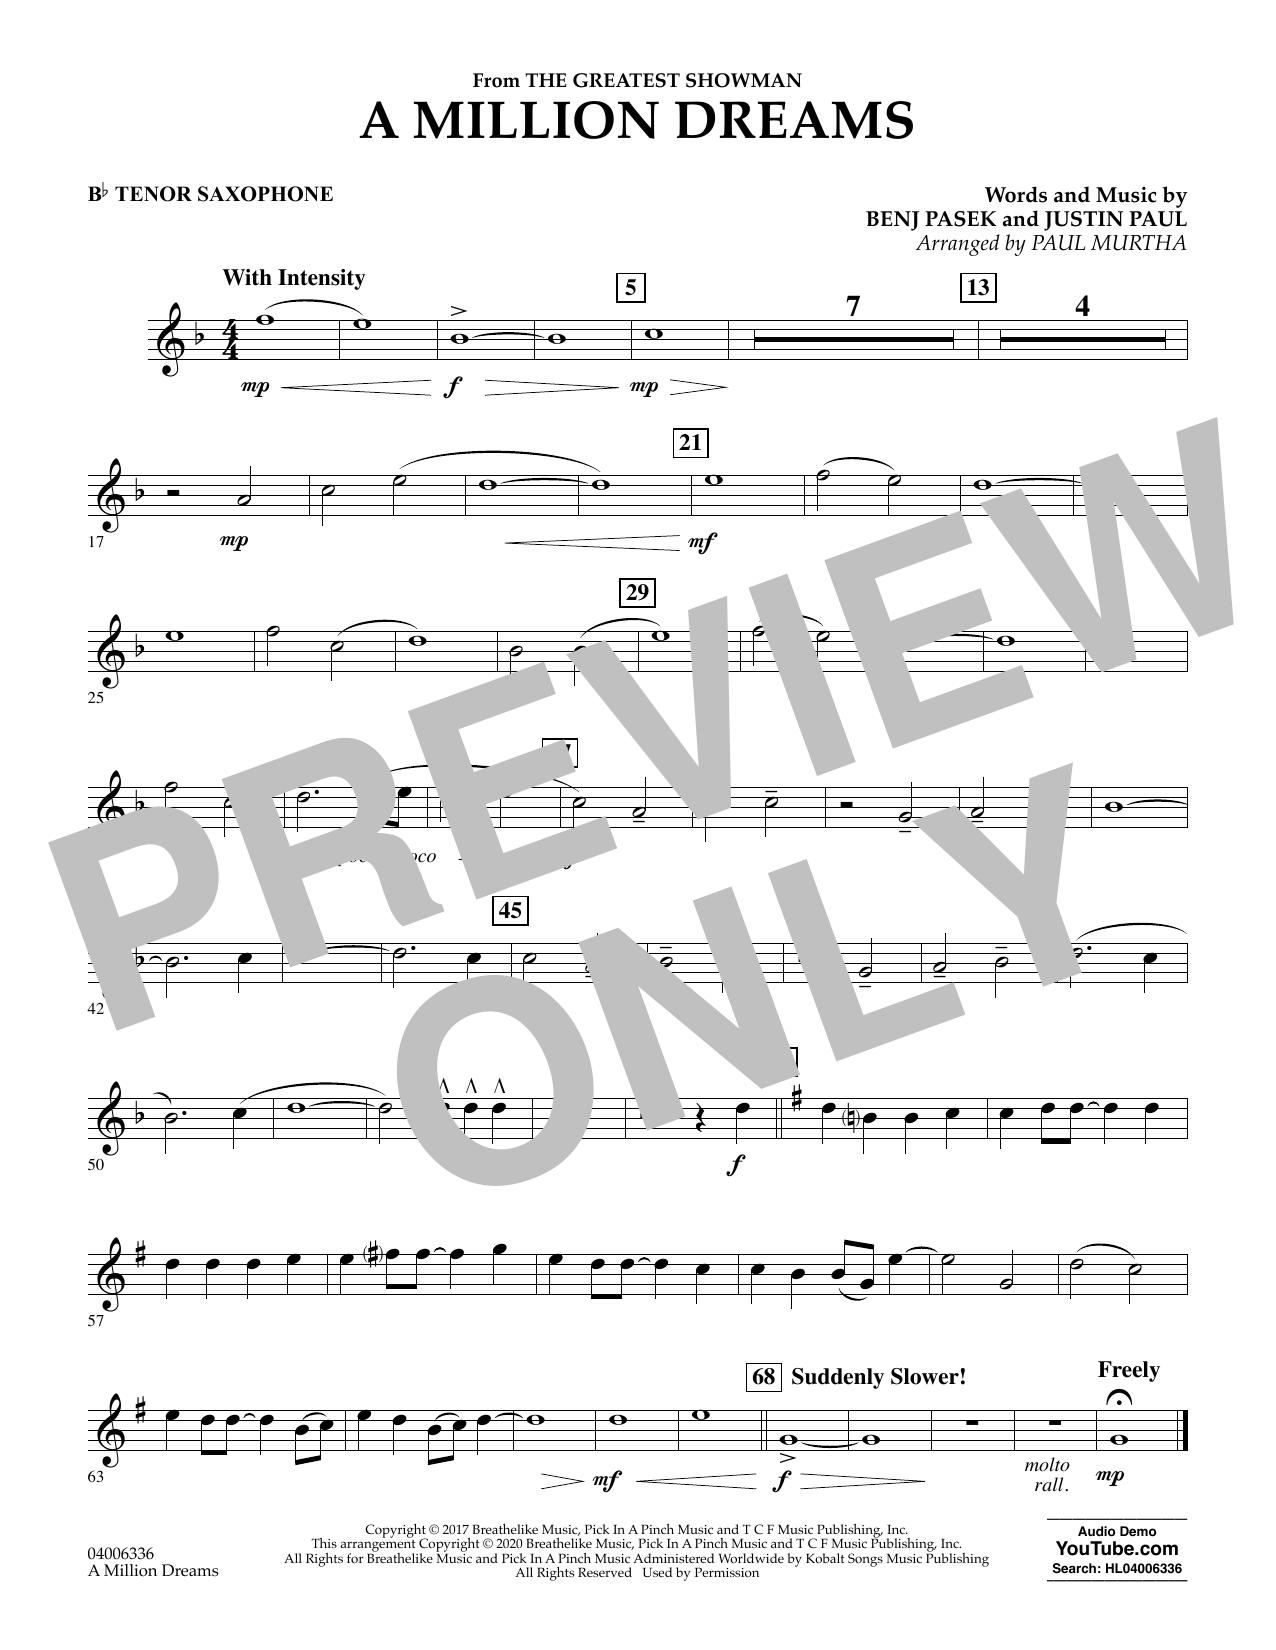 A Million Dreams (from The Greatest Showman) (arr. Paul Murtha) - Bb Tenor Saxophone (Concert Band)